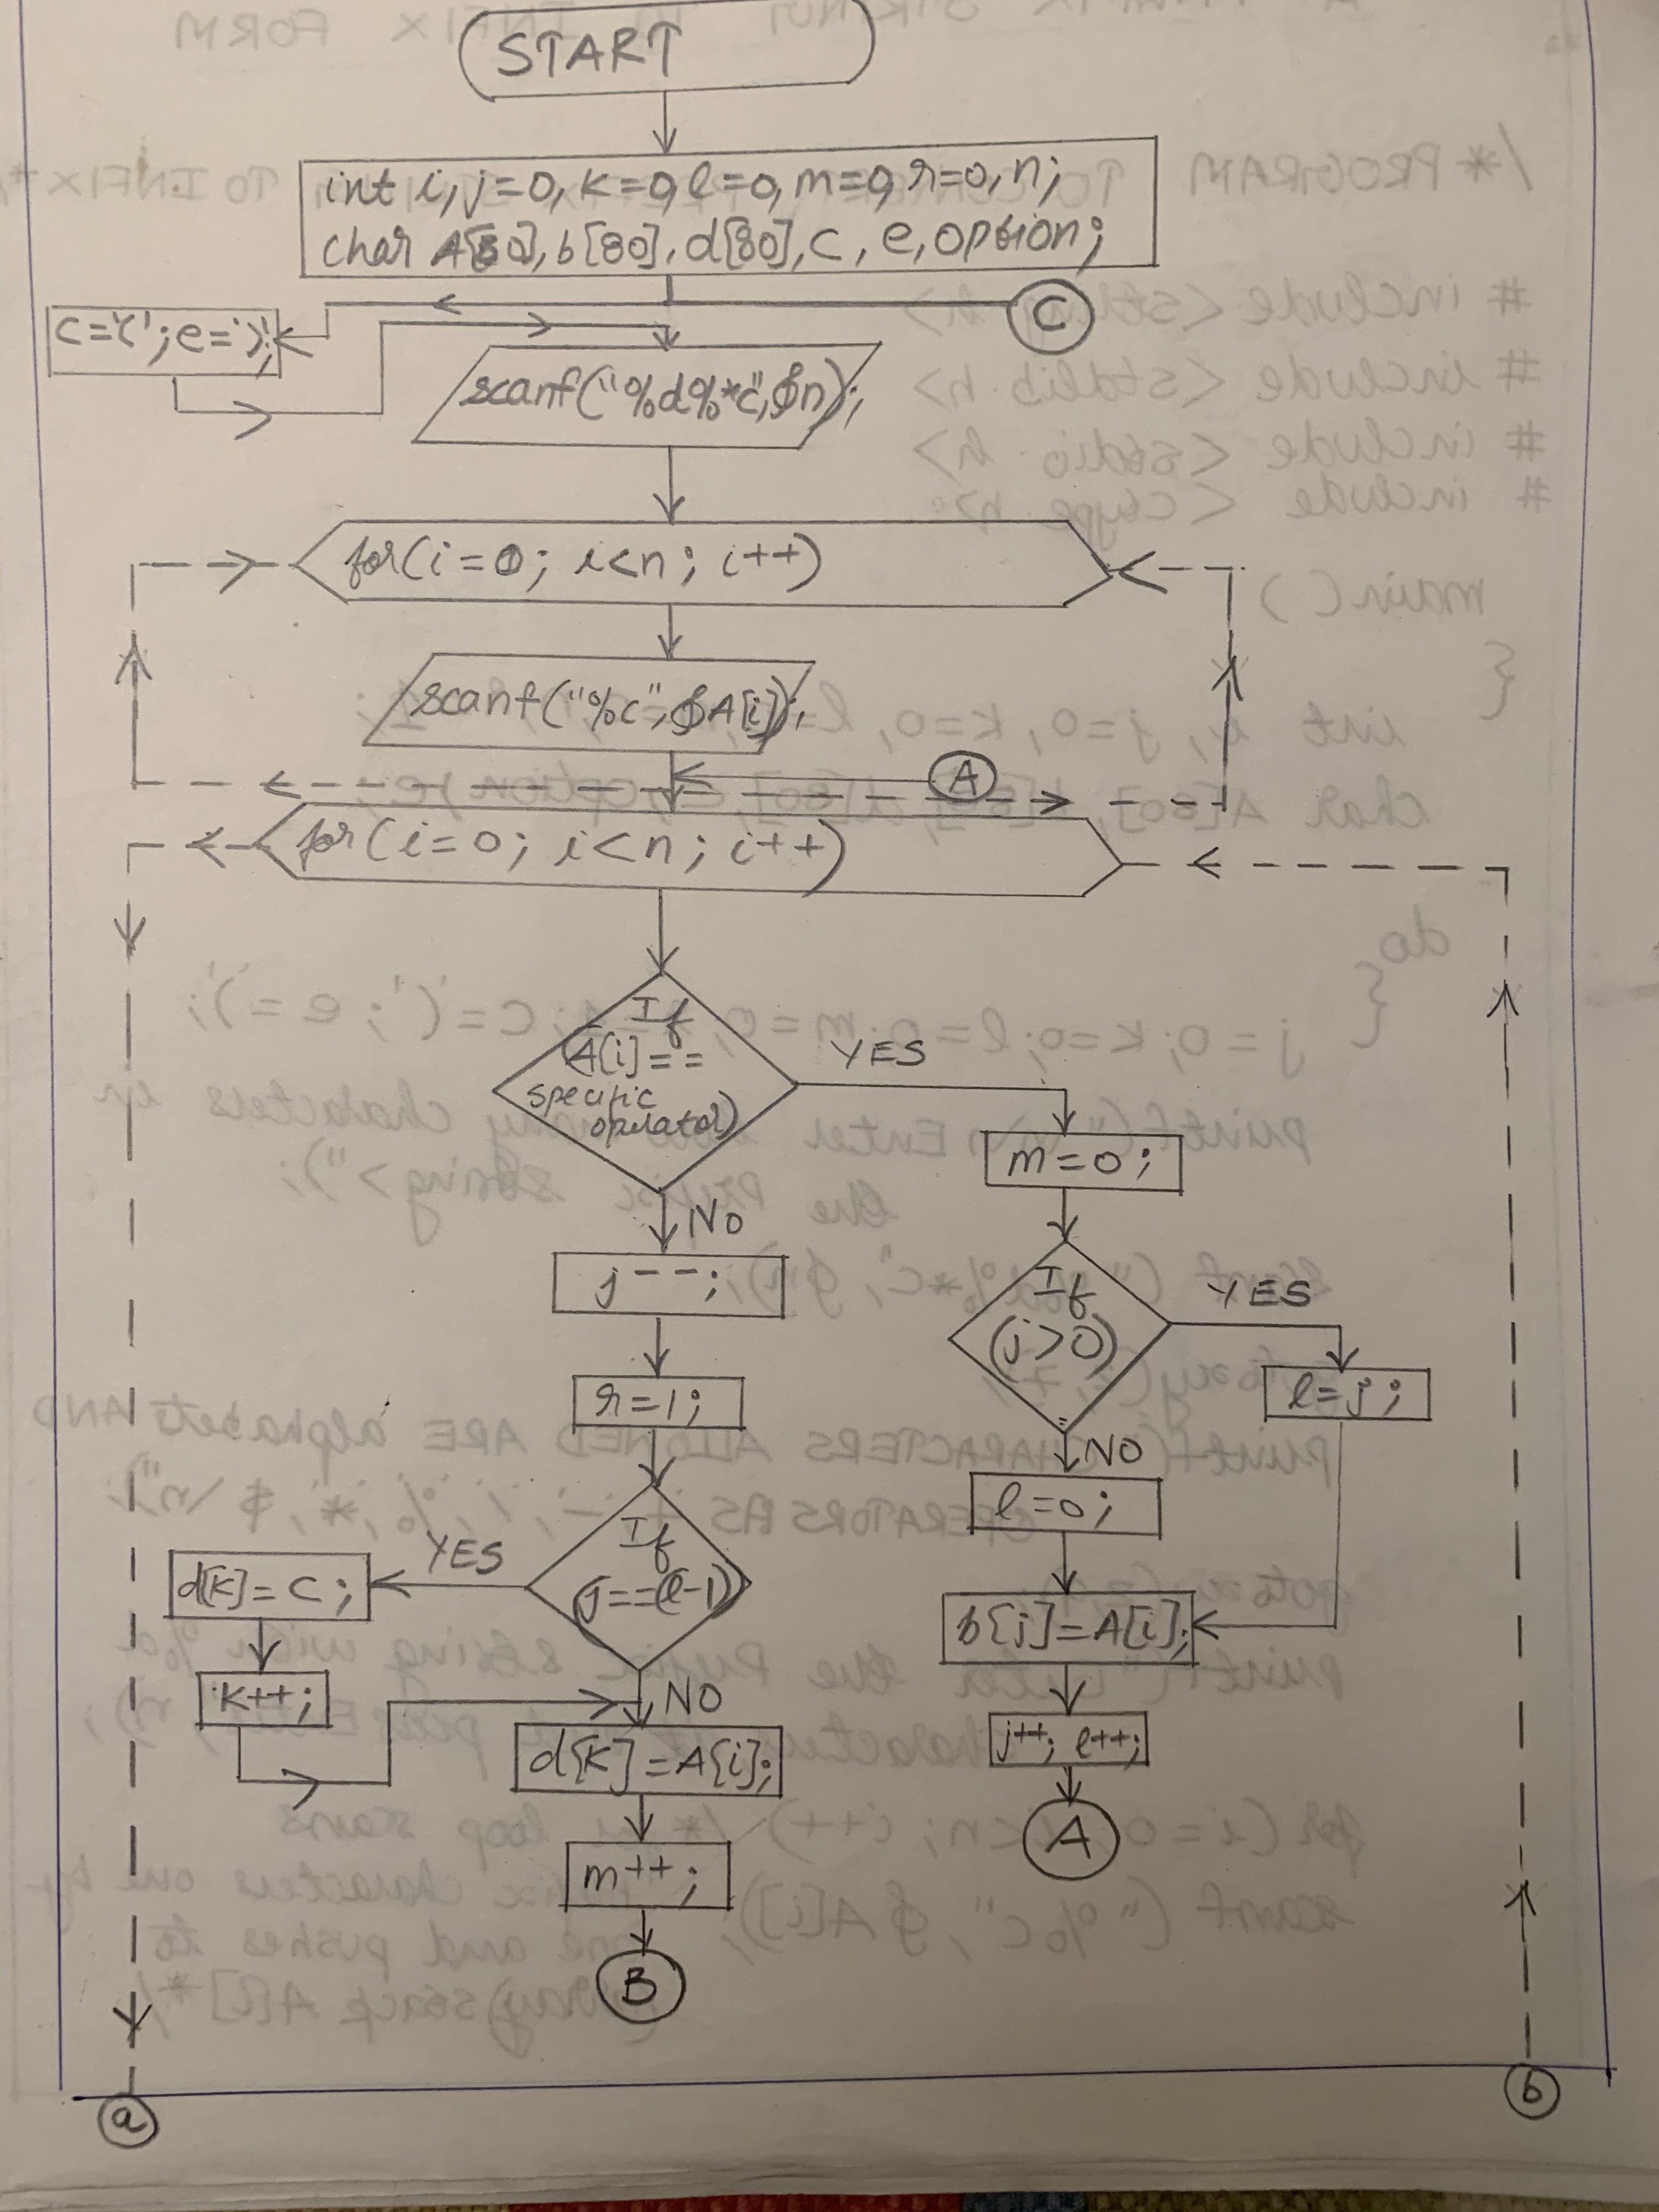 C program to convert prefix string to infix form